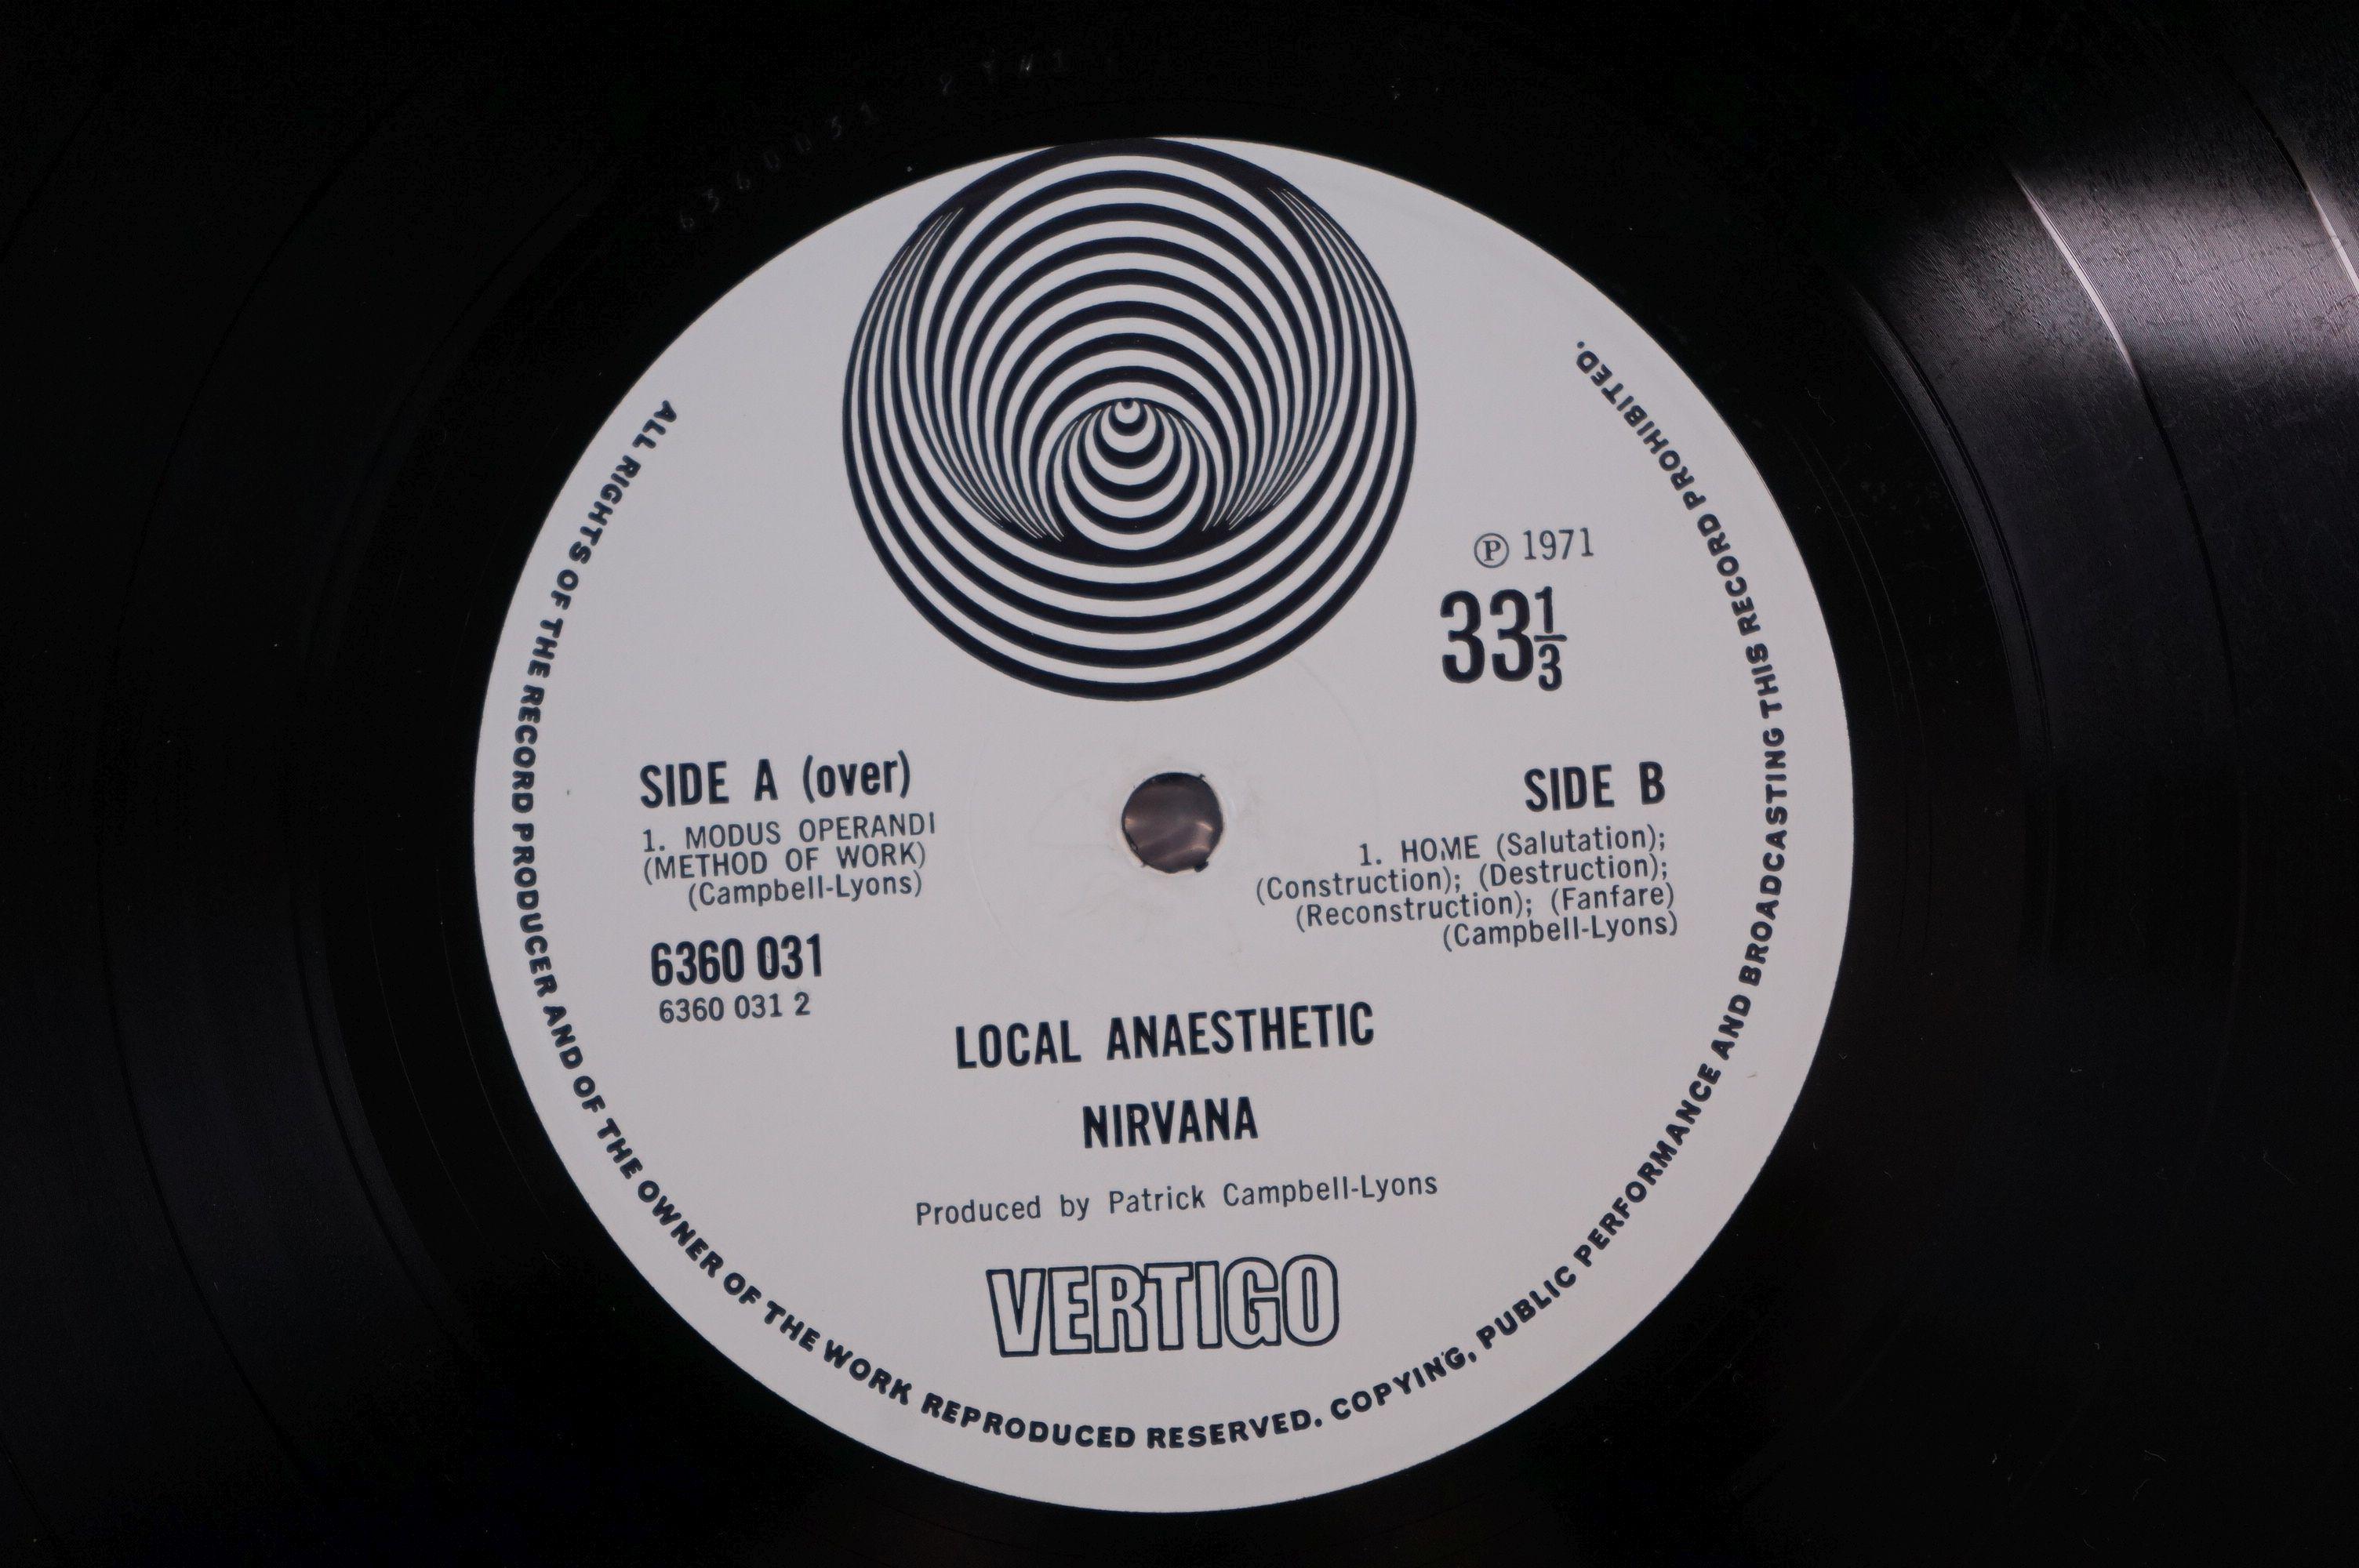 Vinyl - Nirvana Local Anaesthetic LP on Vertigo VO 6360031 gatefold sleeve, swirl logo, swirl - Image 6 of 8